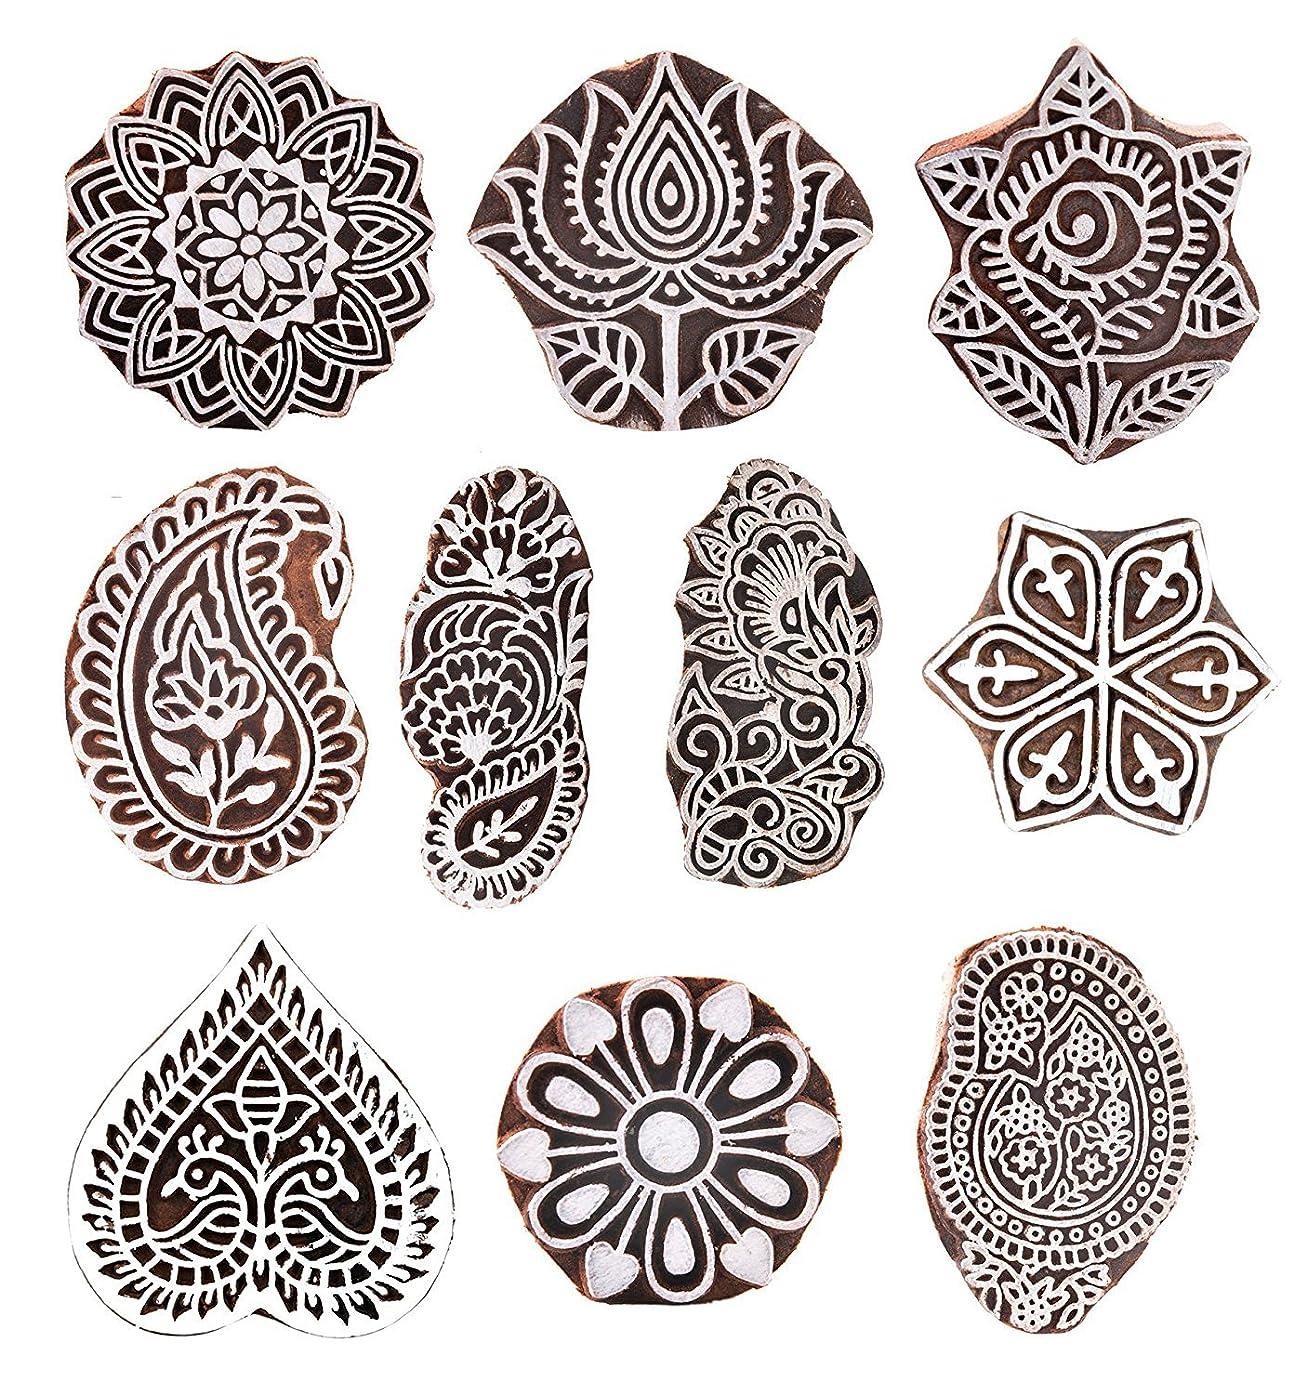 JGARTS Printing Stamps Mughal Design Wooden Blocks (Set of 10) Hand-Carved for Saree Border Making Pottery Crafts Textile Printing Handmade INDIA